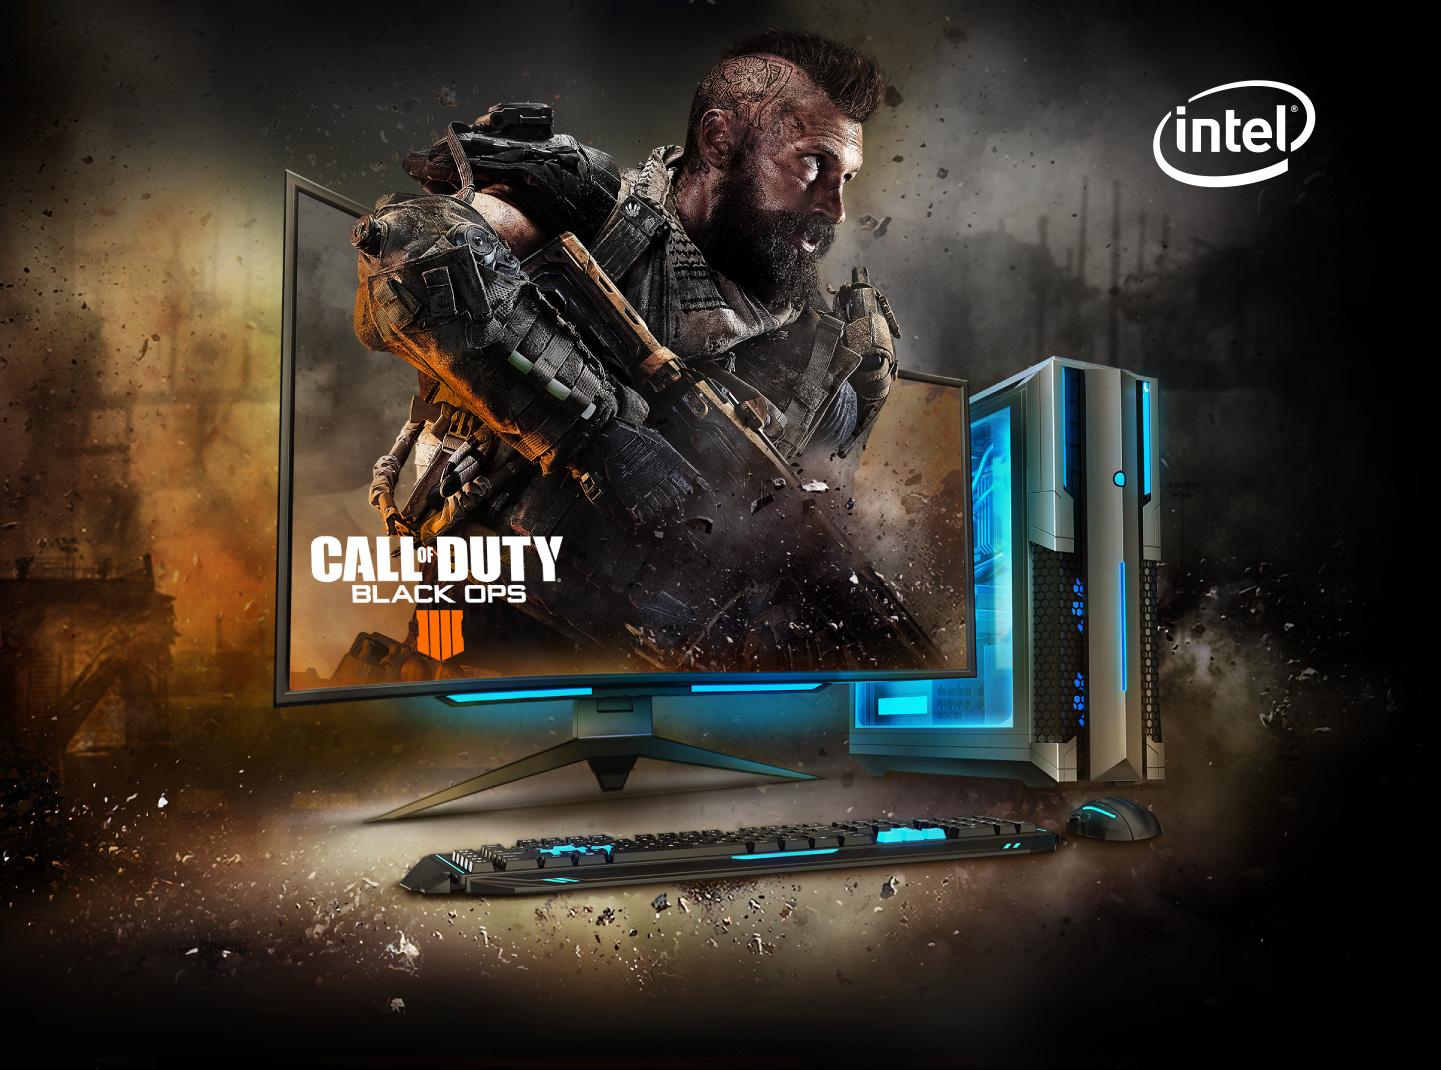 Intel Call of Duty: Black Ops 4 Header